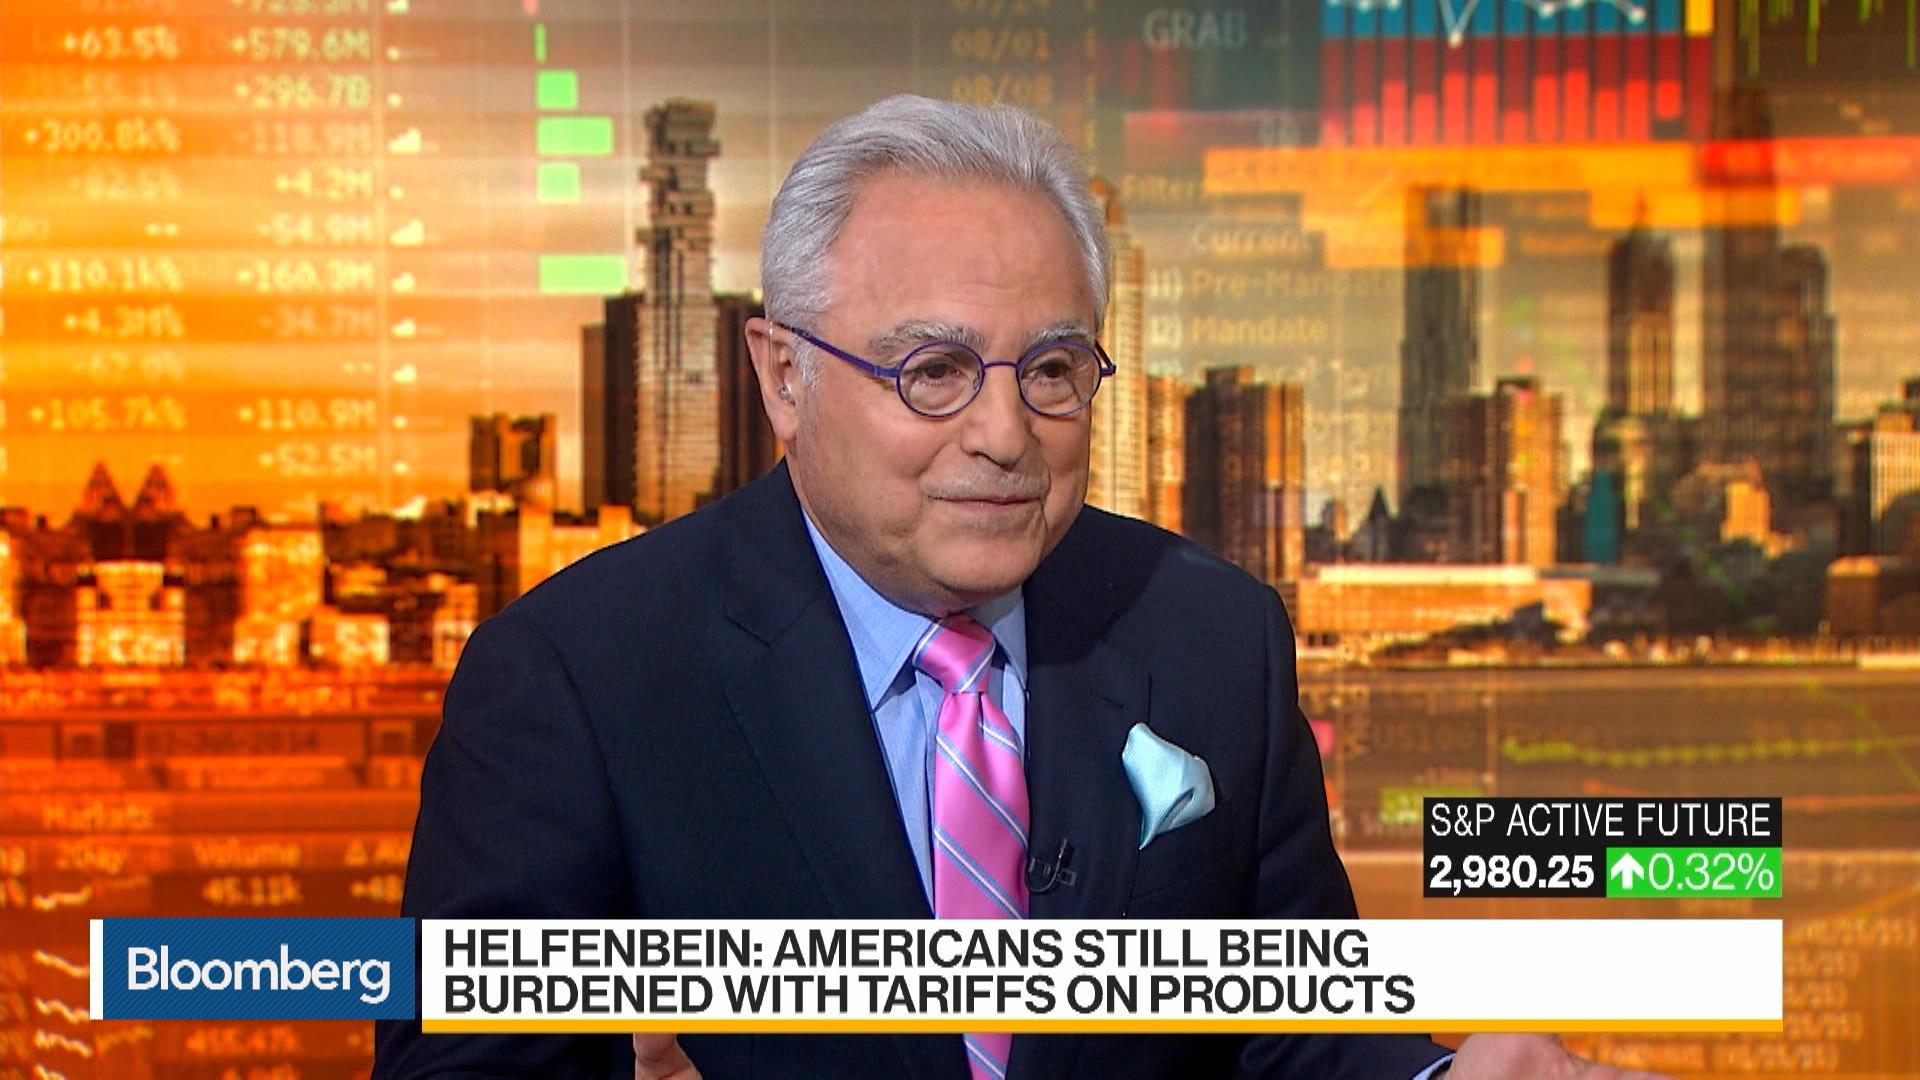 American Apparel & Footwear Association President & CEO Rick Helfenbein on 'Partial' Trade Deal